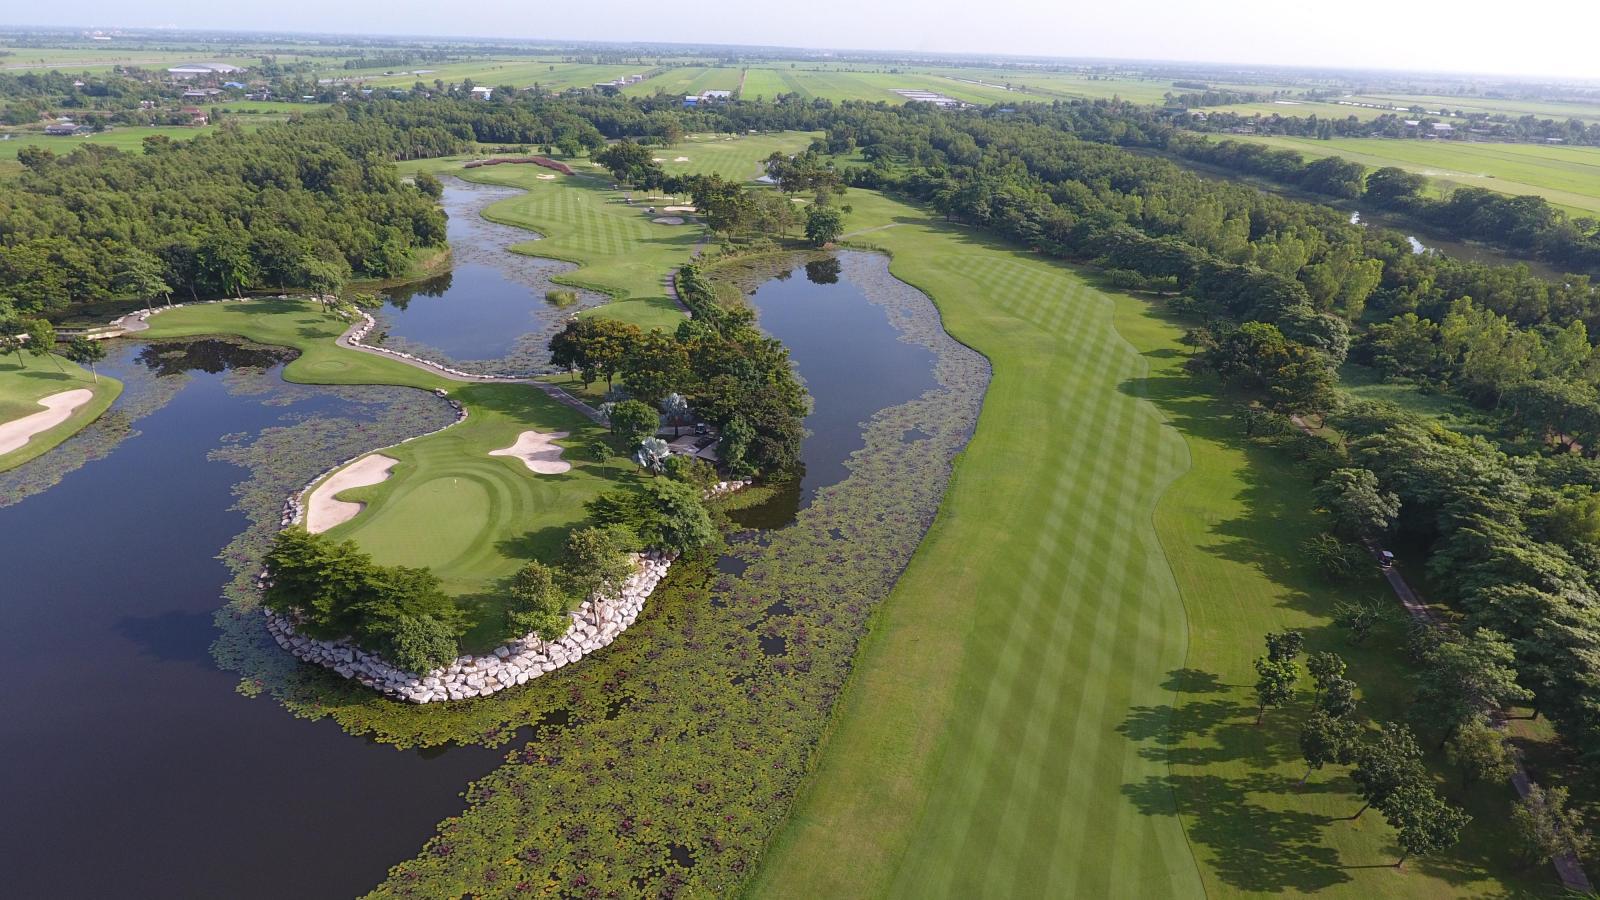 Lotus valley golf resort book golf online golfscape - Golf cart rentals garden city sc ...